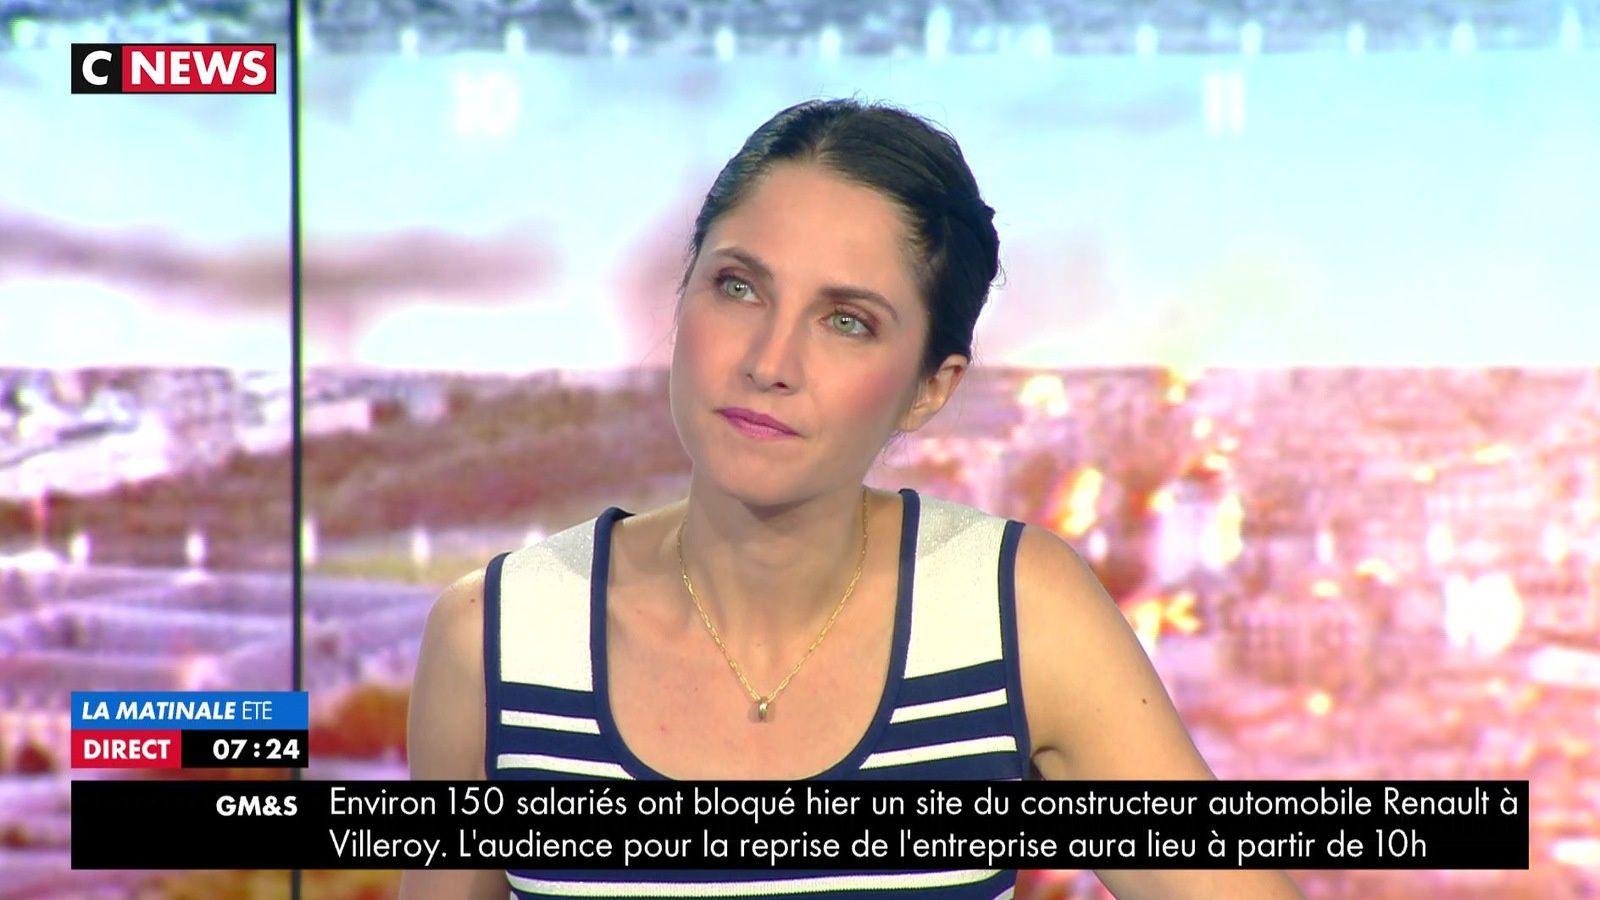 📸11 CLELIE MATHIAS @cleliemathias @JohannaCarlosD8 @cnews ce matin #LamatinaleETE #vuesalatele